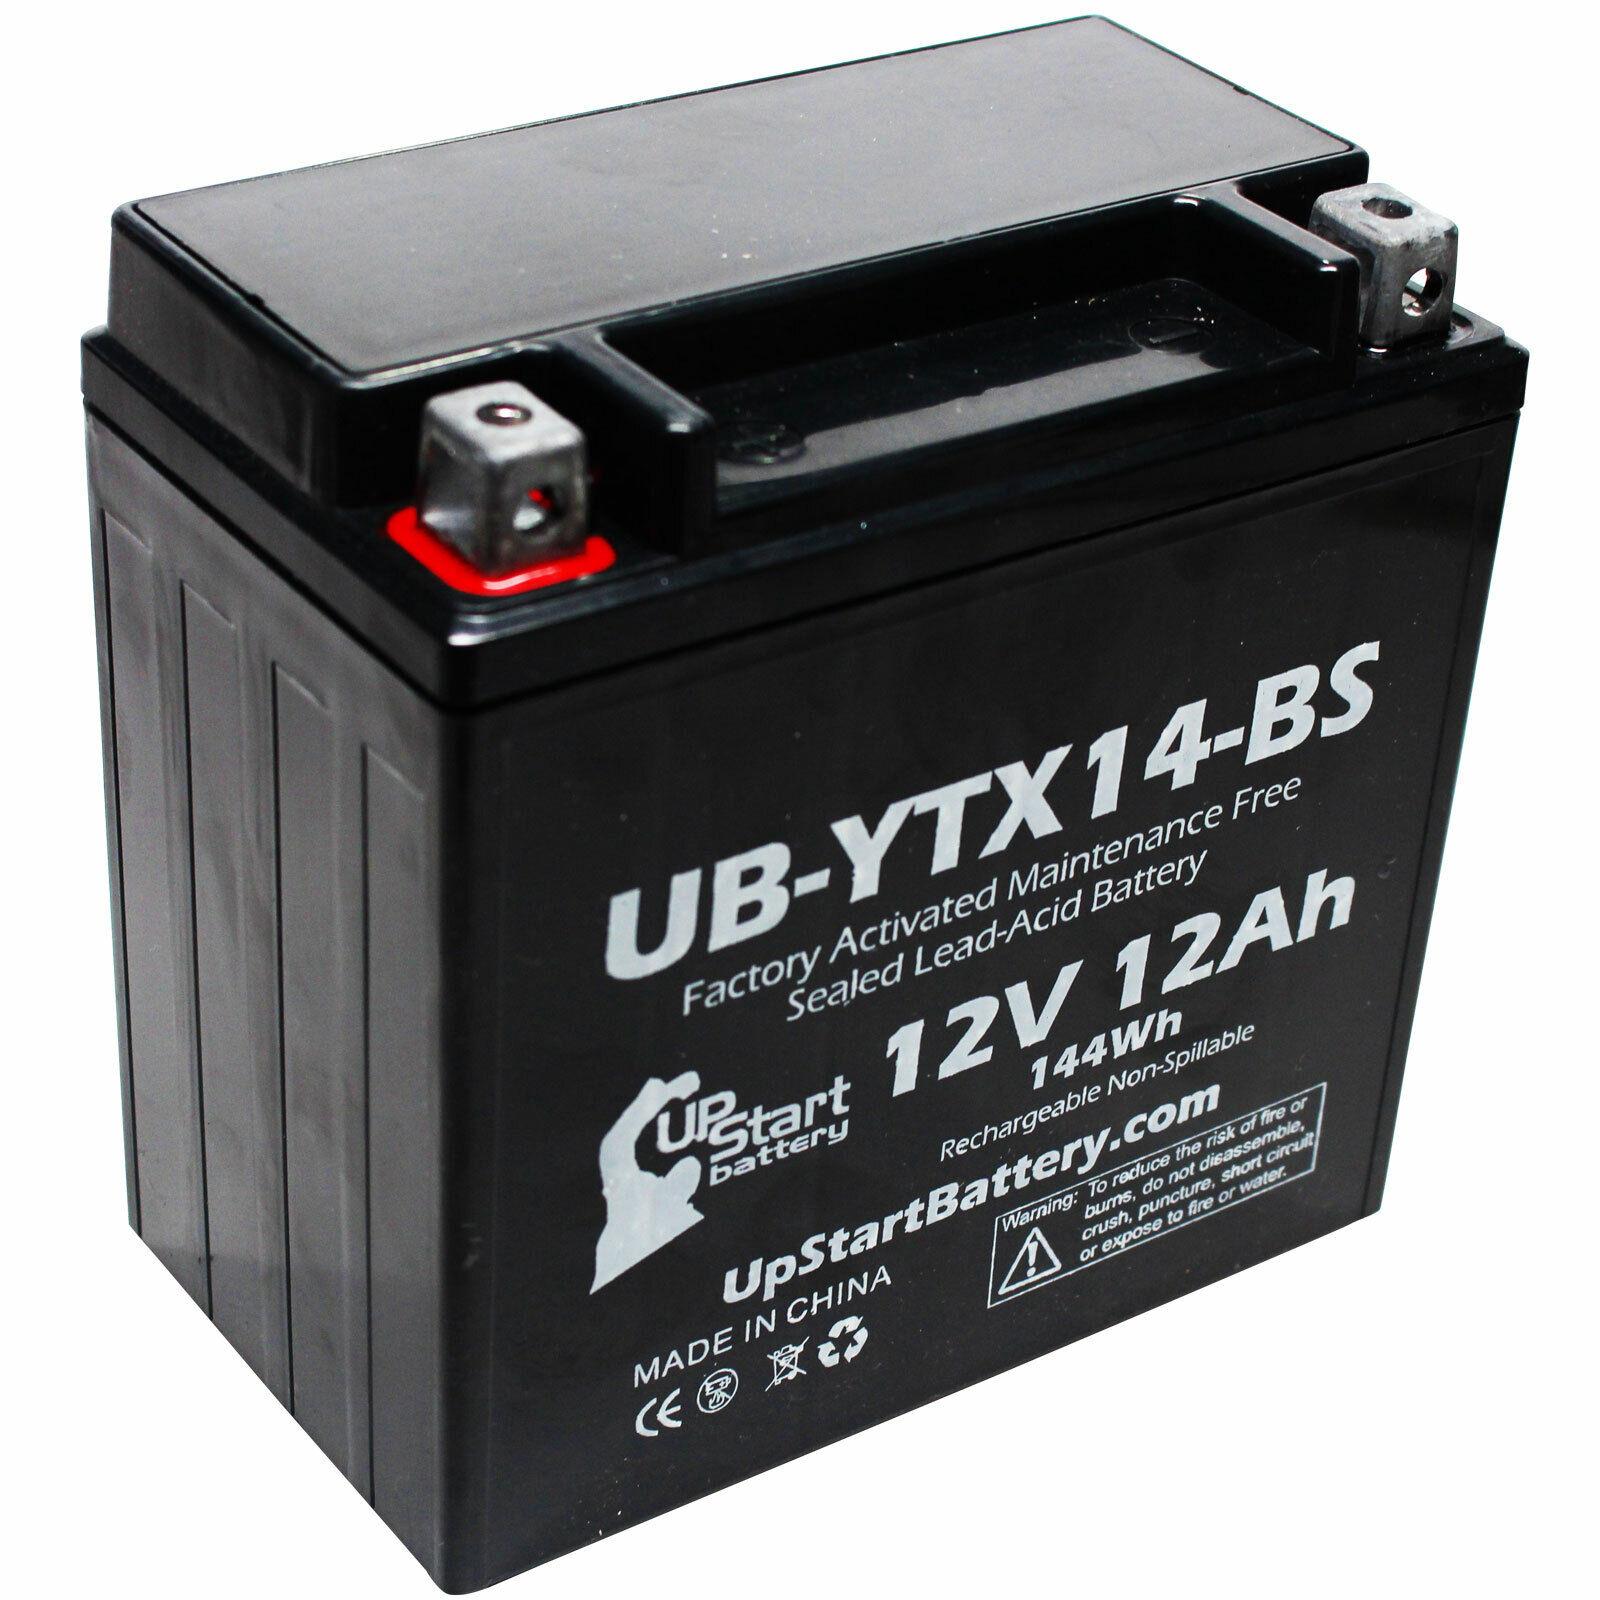 12V 12AH Battery for 1999 Honda TRX400FW Foreman 400 CC